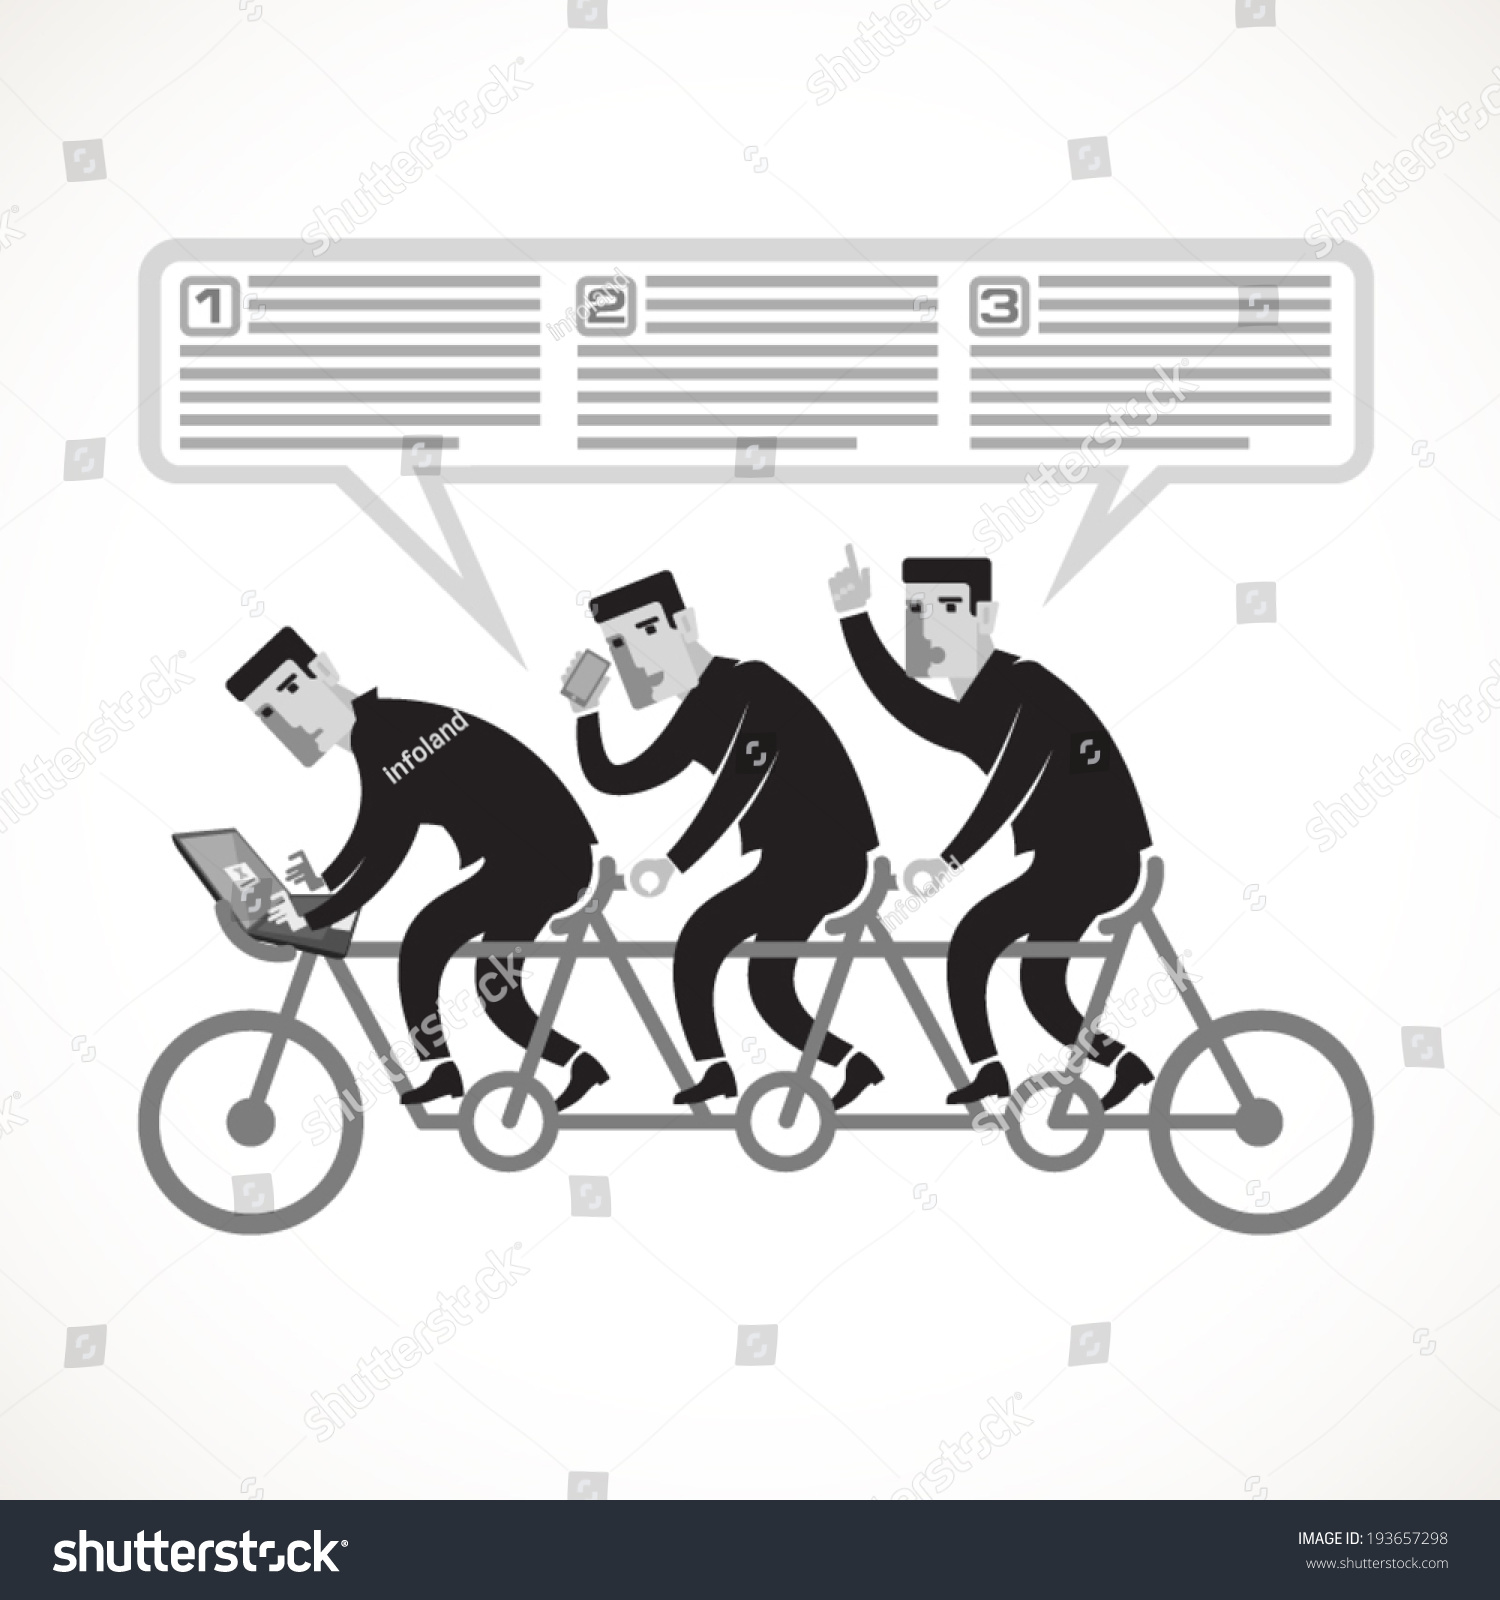 businessmen cycling on a tandem bike as an example of teamwork businessmen cycling on a tandem bike as an example of teamwork stock vector illustration 193657298 shutterstock